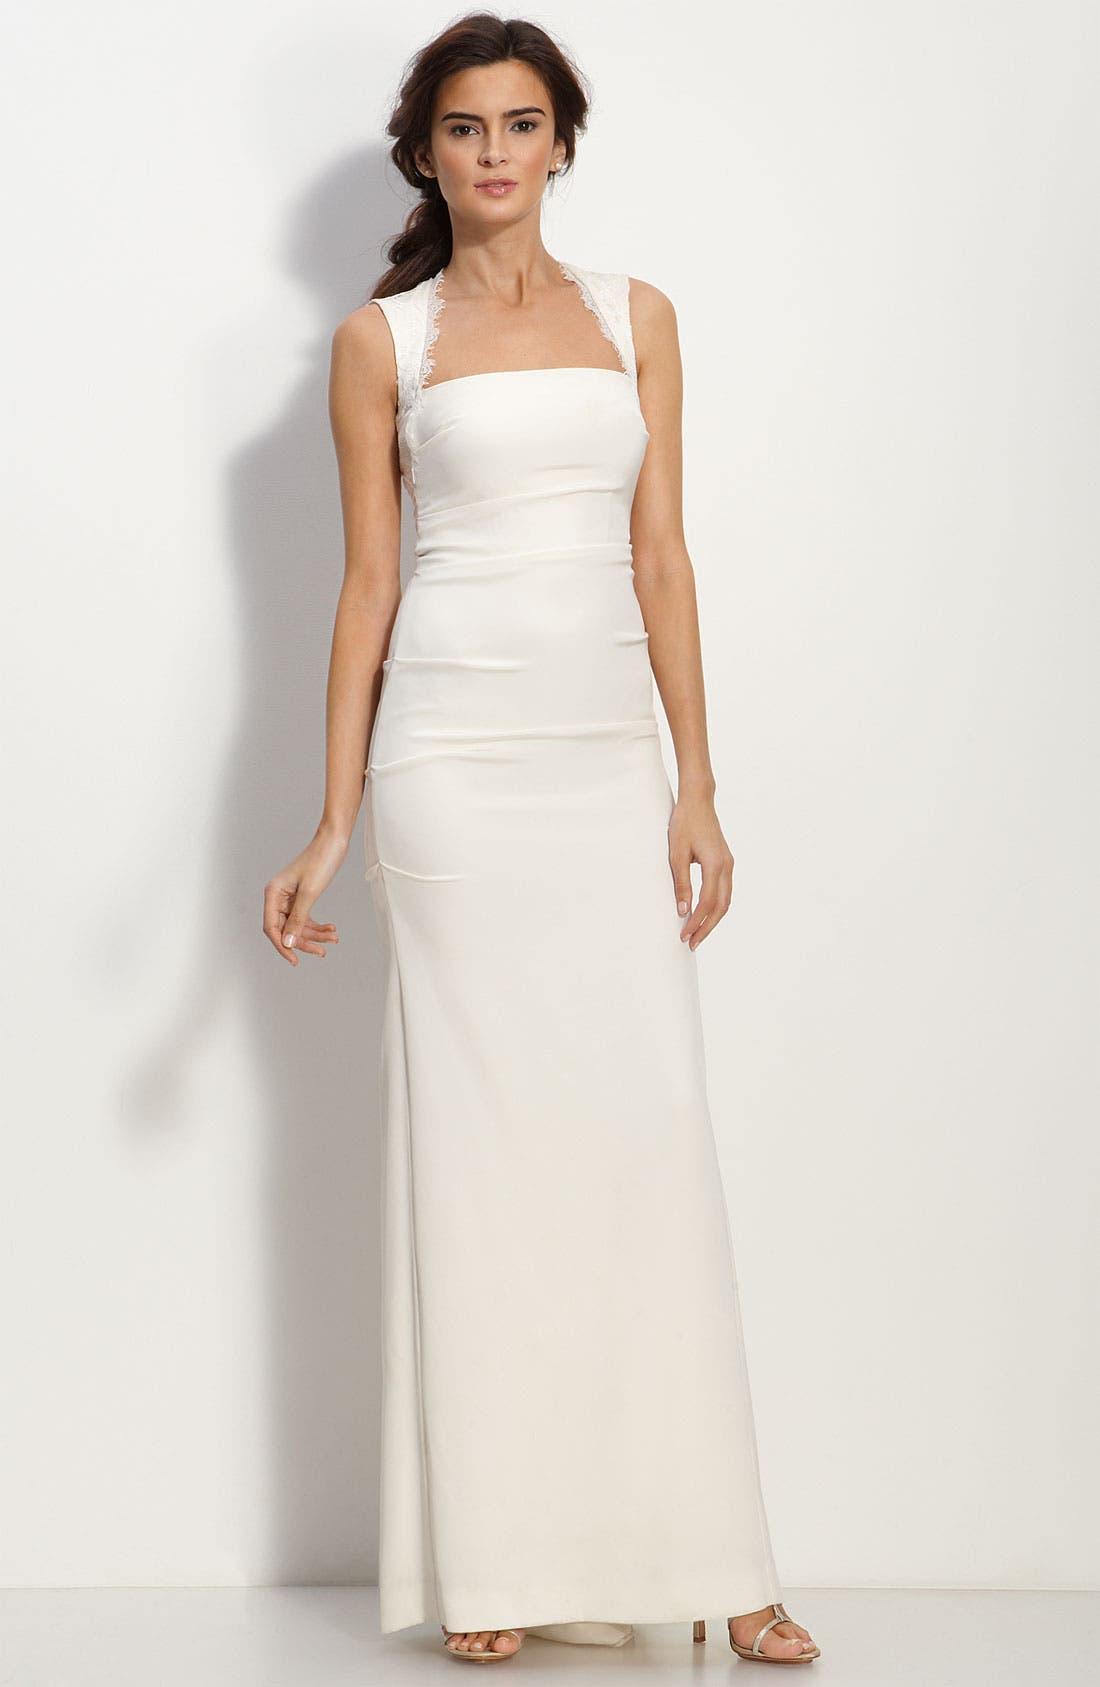 Nordstrom Nicole Miller Wedding Dresses